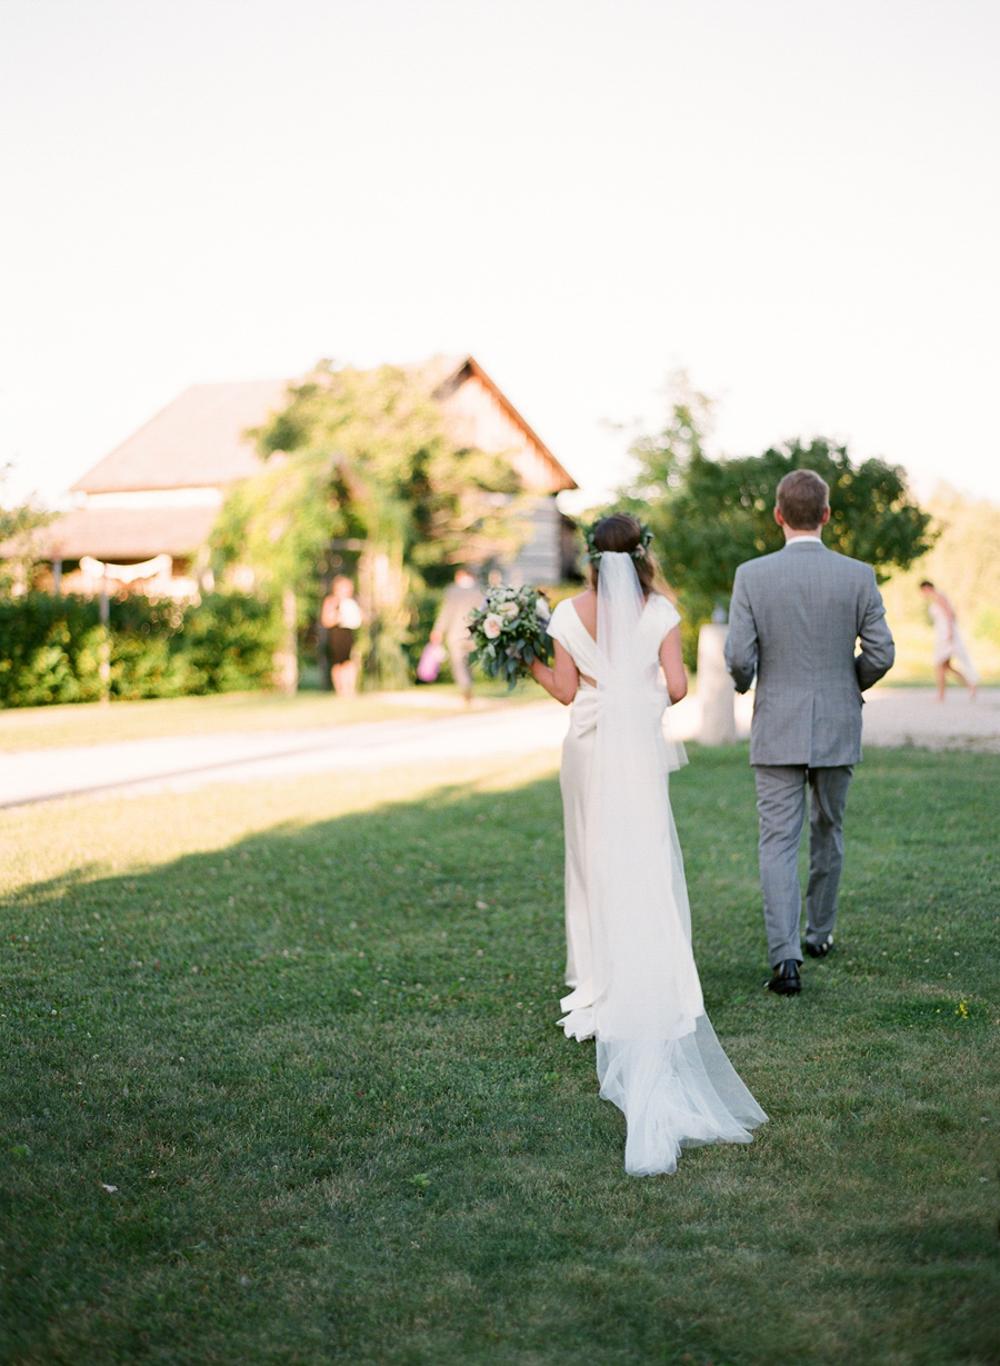 Ramhorn_Farm_Wedding_Photos_036.jpg